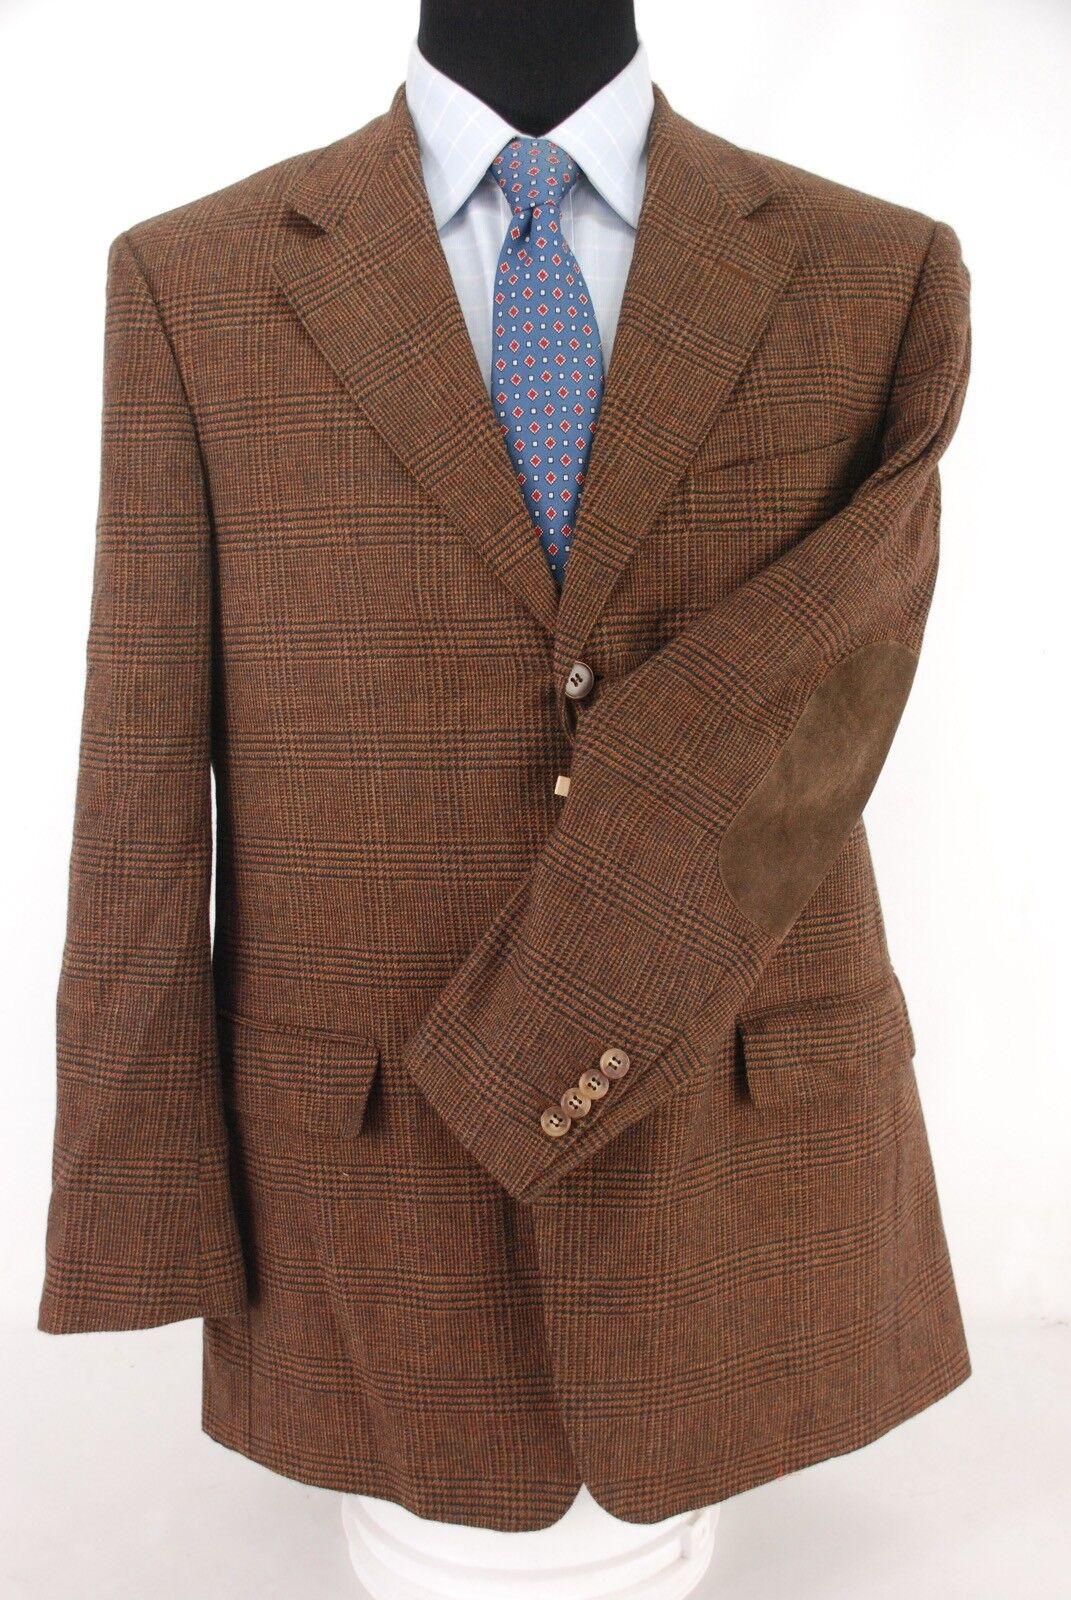 Ermenegildo Zegna 3Btn Shetlair Wool Mohair Cashmere Sport Coat Plaid Patch 42R